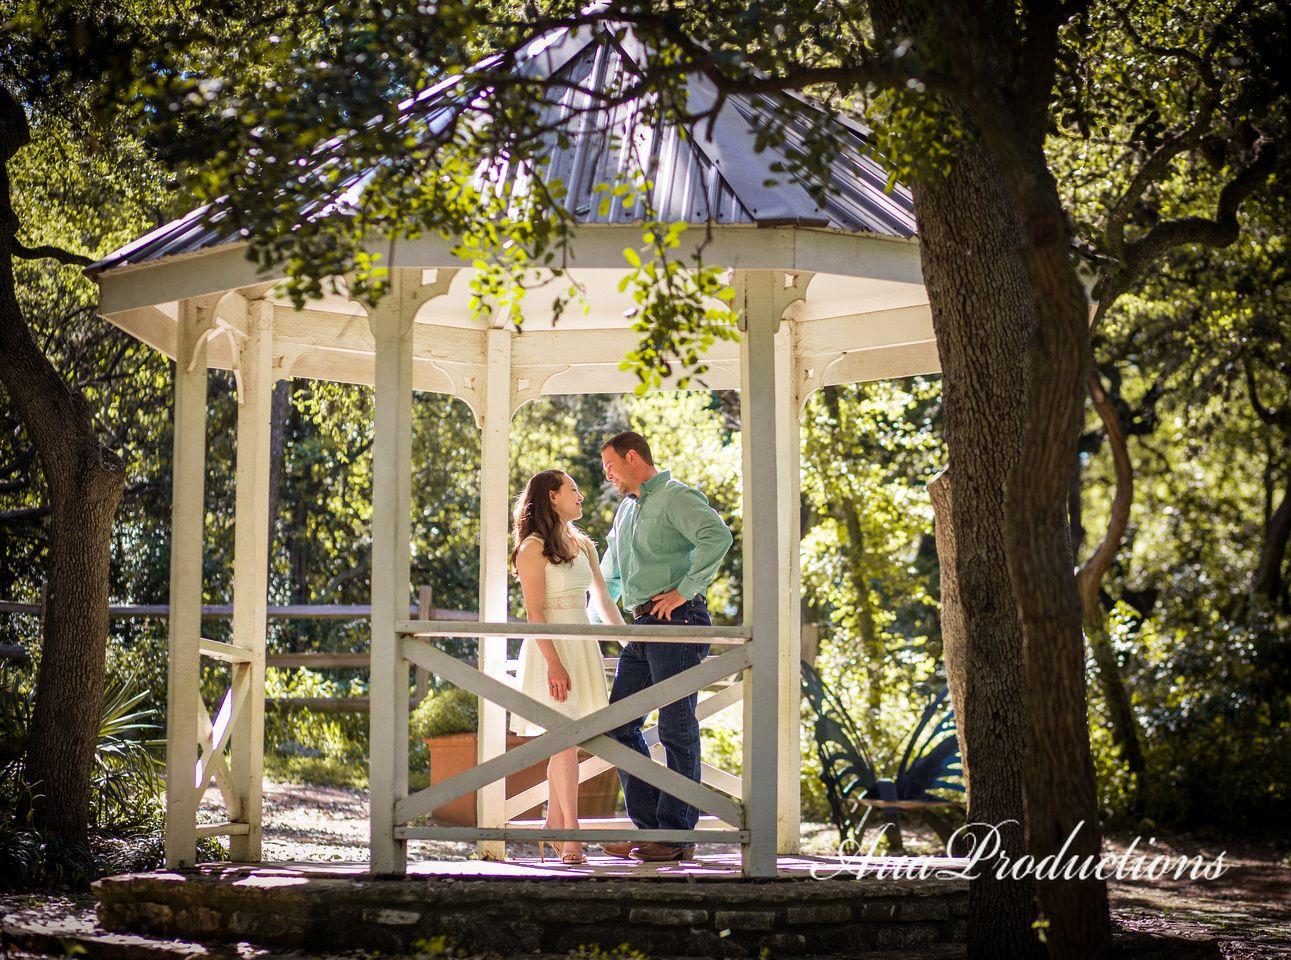 Jaime Jessica Engaged At Zilker Botanical Garden Austin Texas Botanical Gardens Botanical Garden